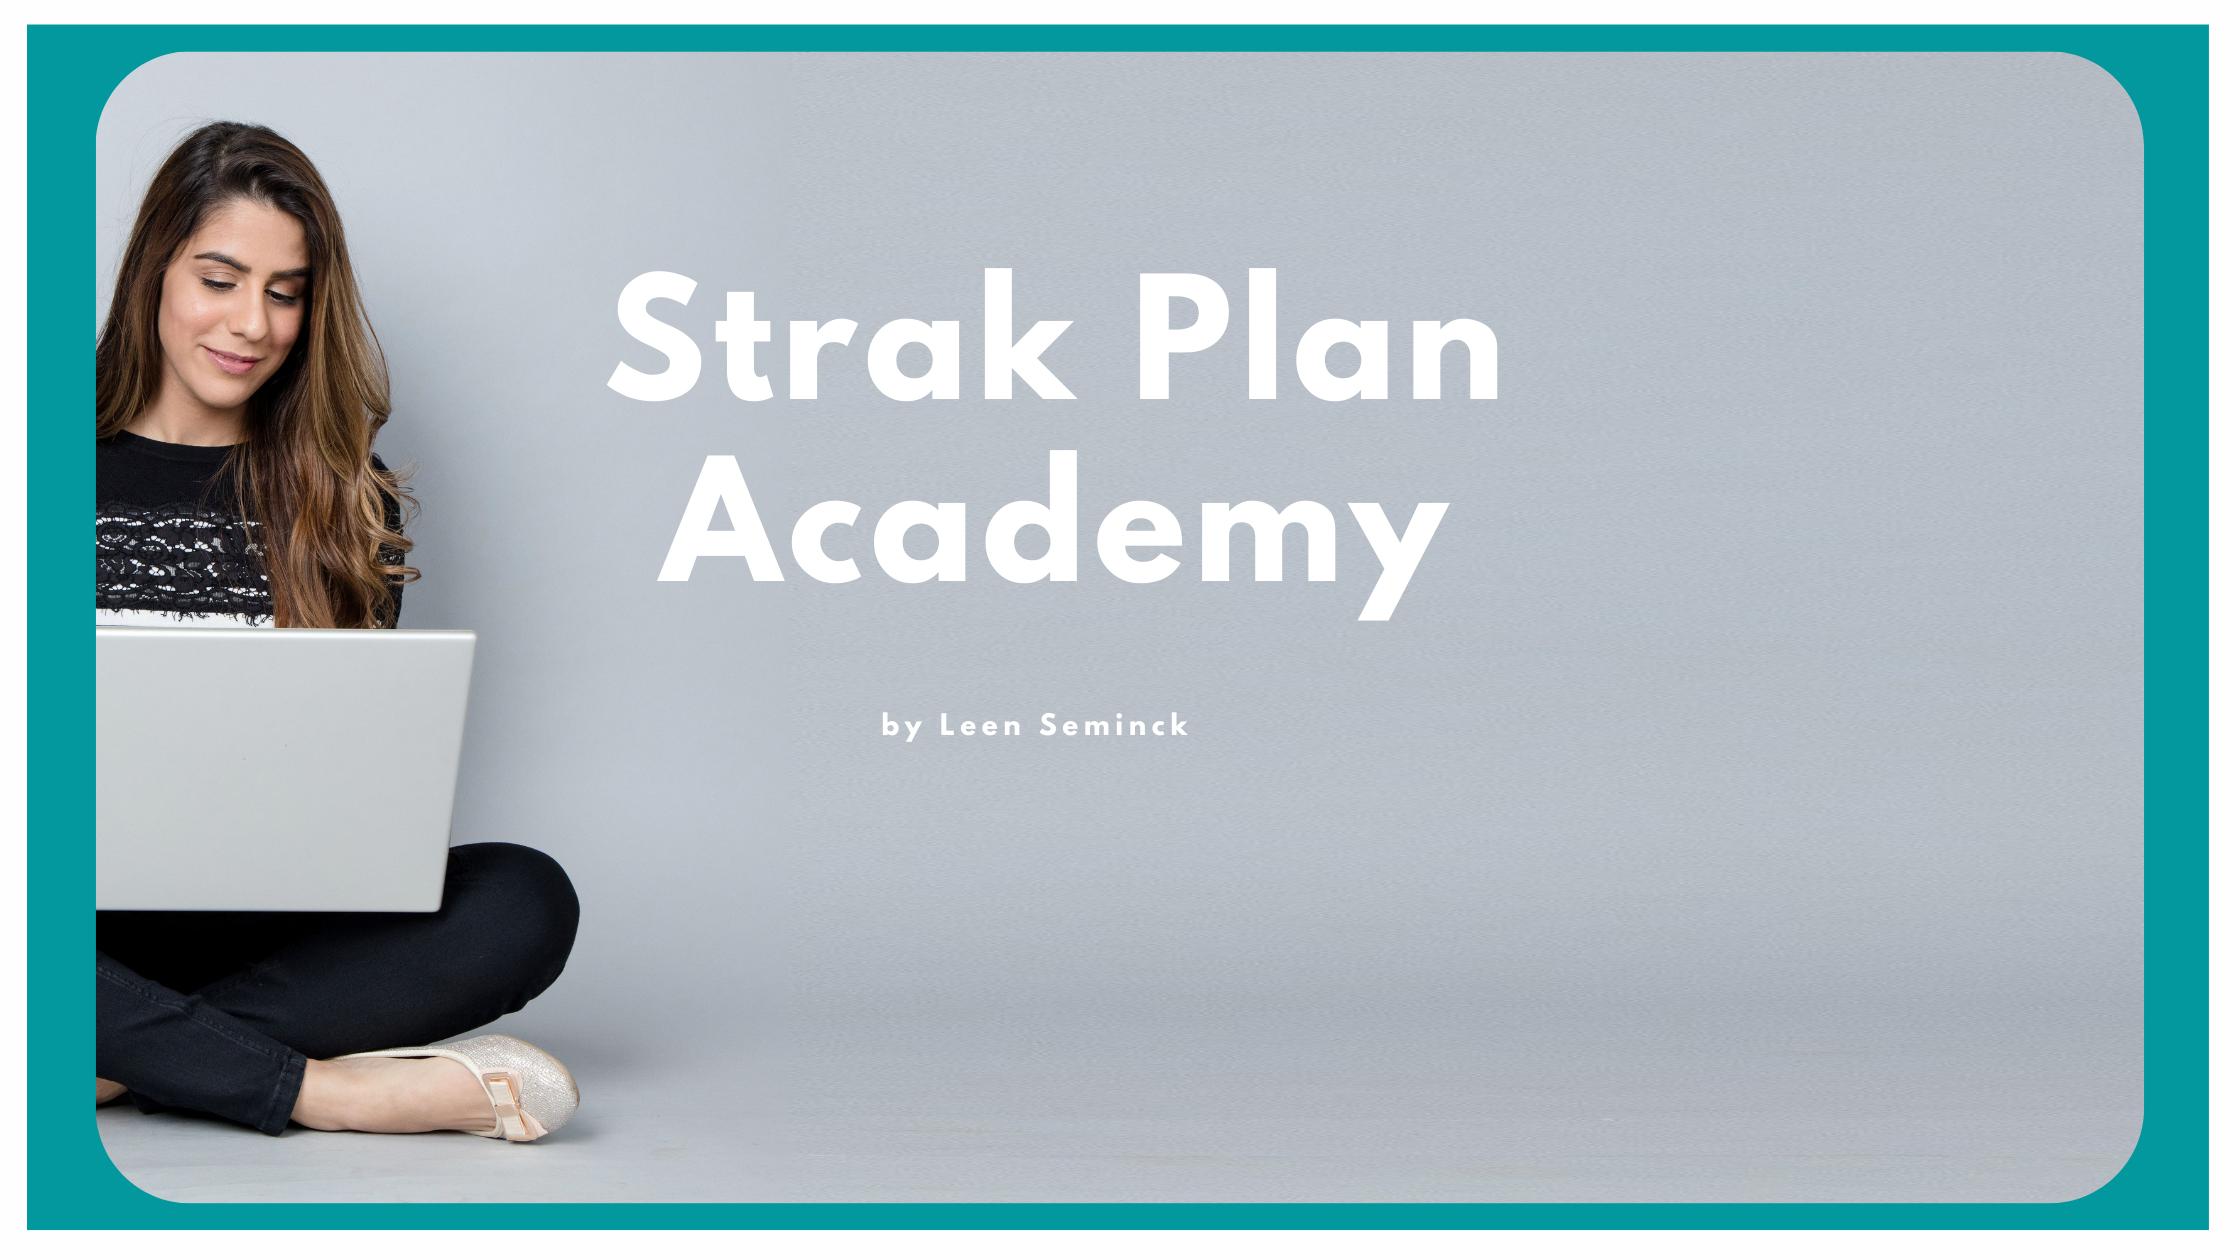 De Strak Plan Academy